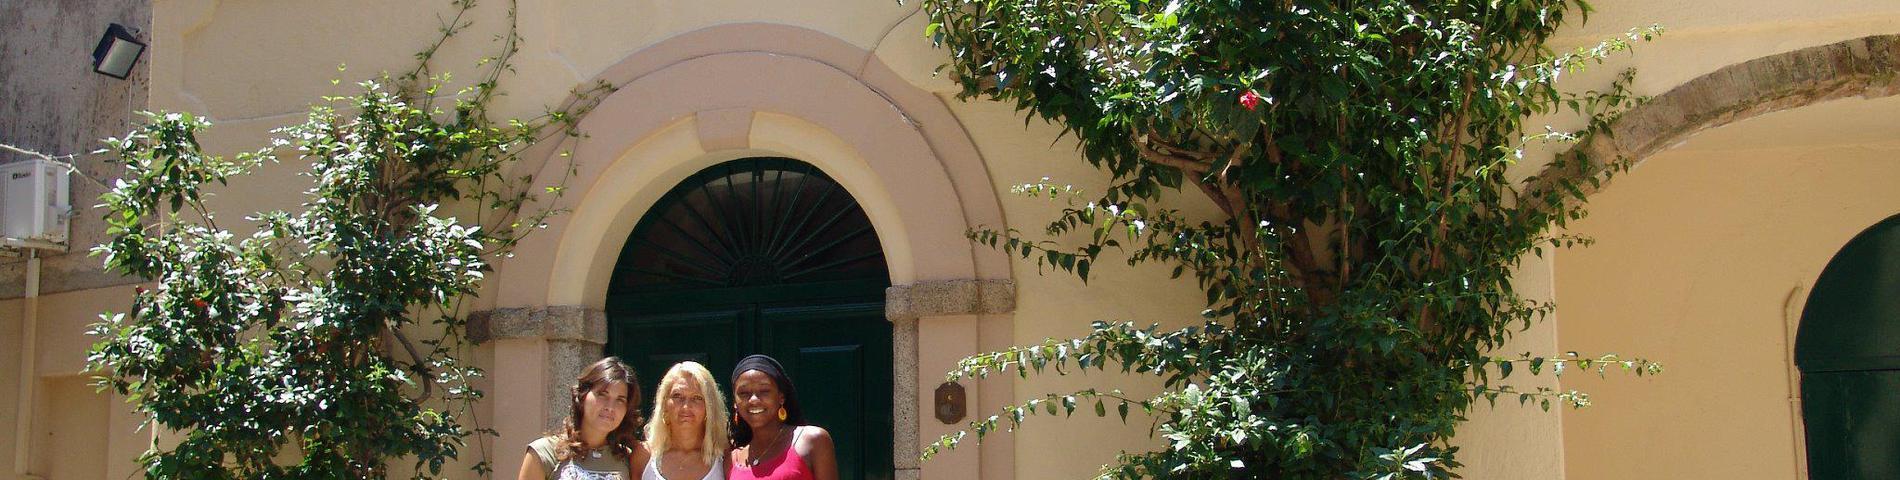 Piccola Universita Italiana billede 1